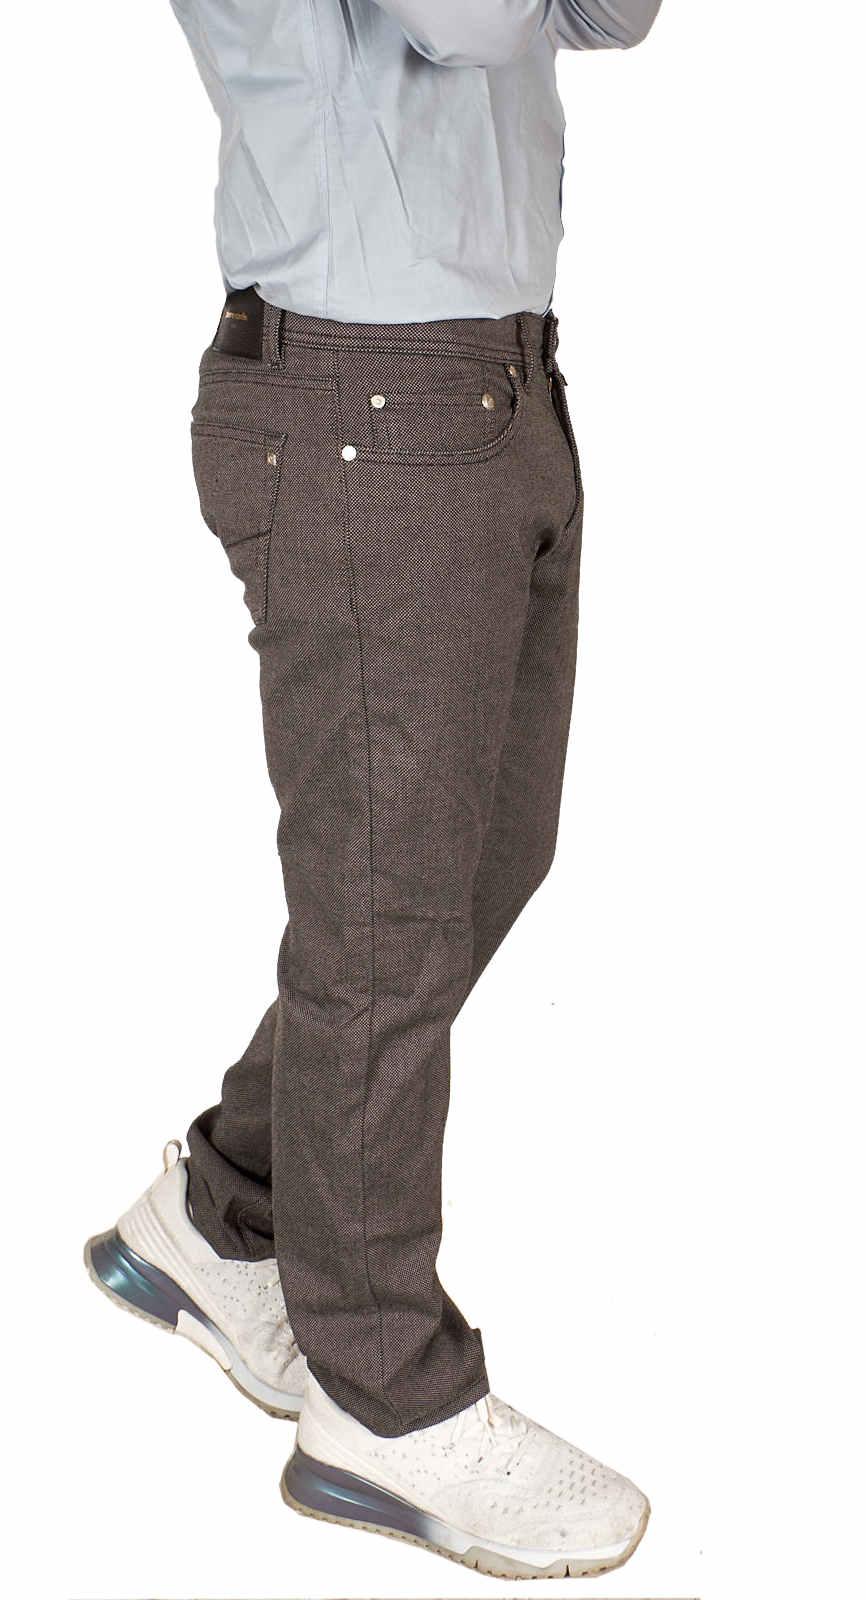 Pierre Chino Coupe Lyon Jeans Cardin Boyau Coupe Moderne Herren Normale fqWwrfanT